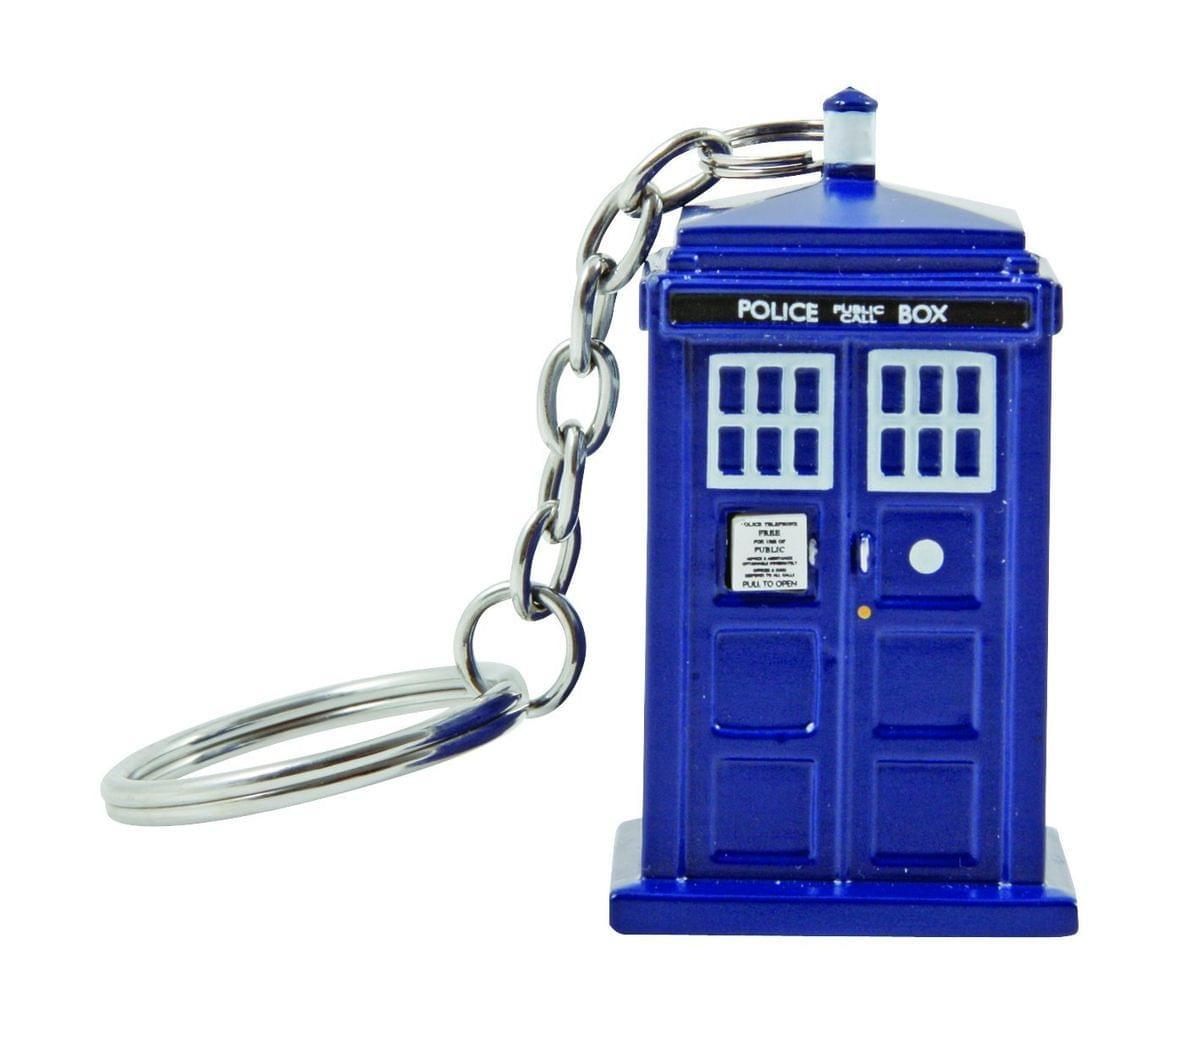 Doctor Who TARDIS Key Chain Flashlight